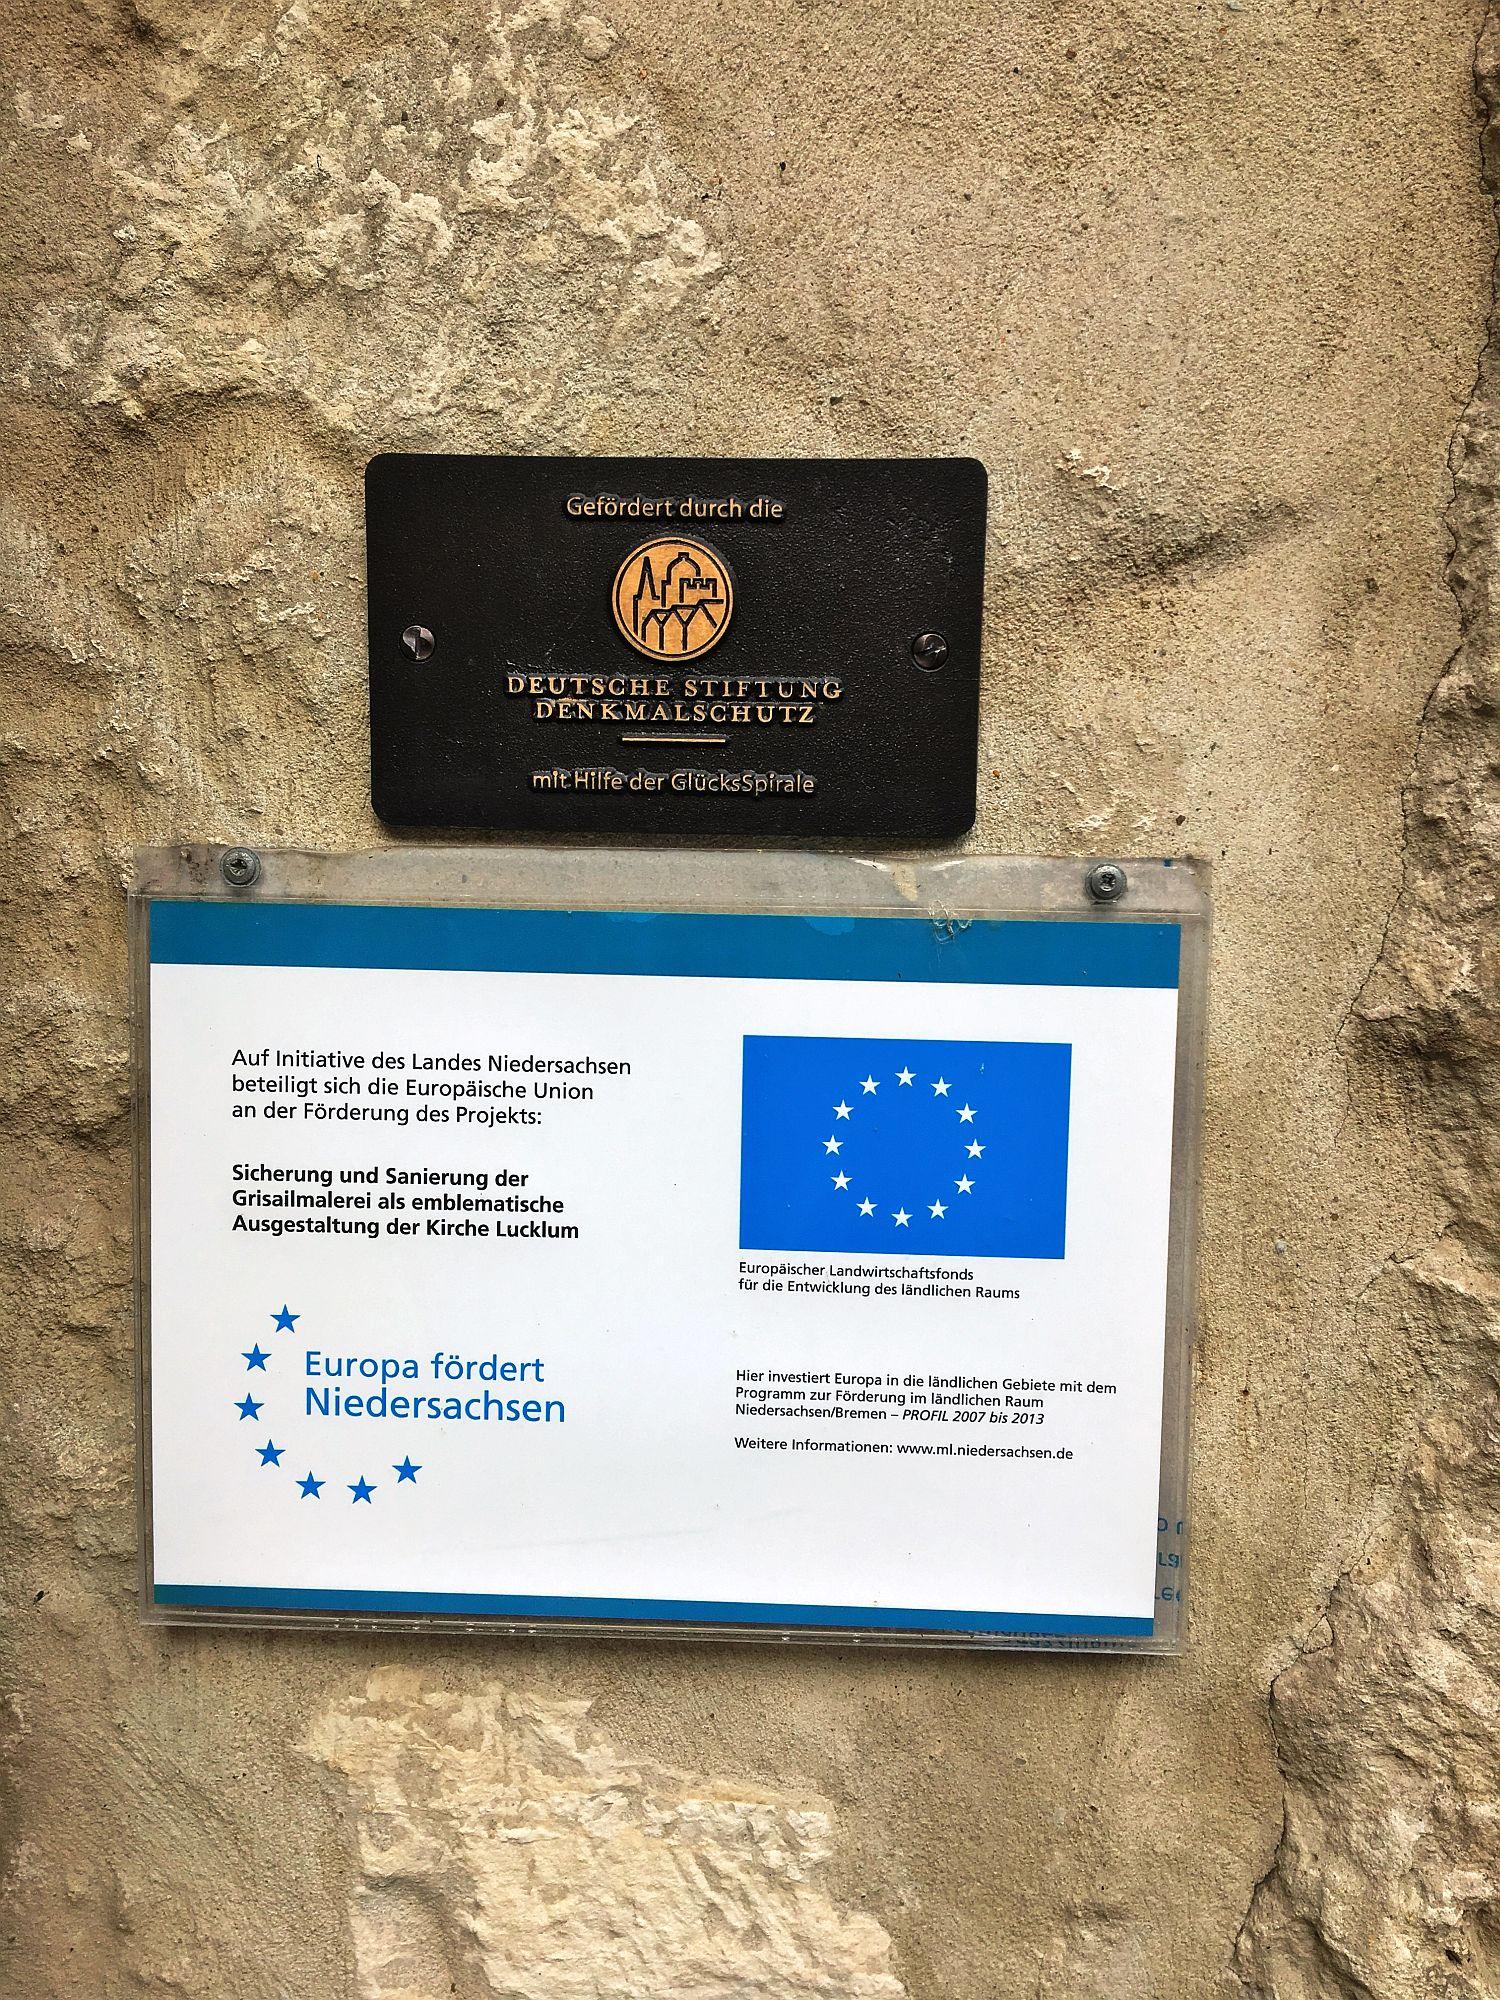 Noerdliches_Harzvorland_Rittergut_Lucklum_EU_gefoerdert